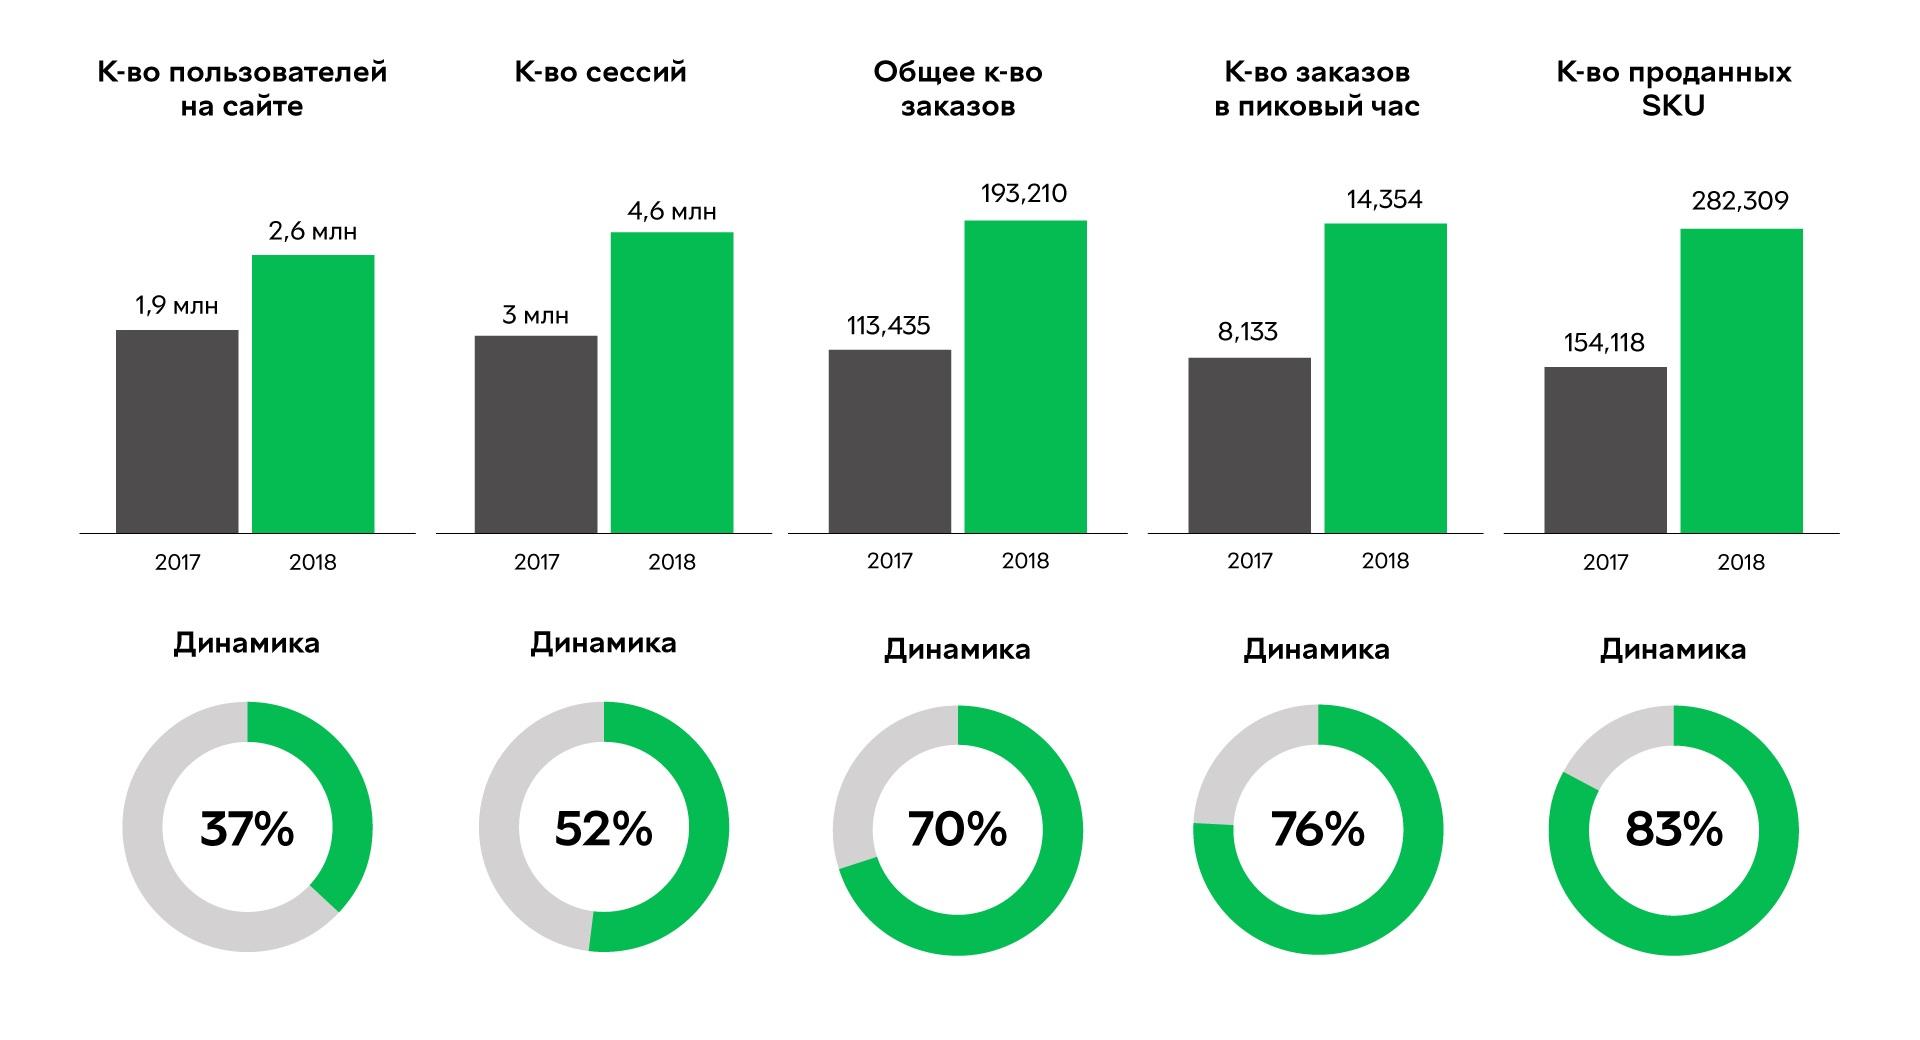 Динамика посещаемости сайта и количества заказов интернет-магазина «Розетка»